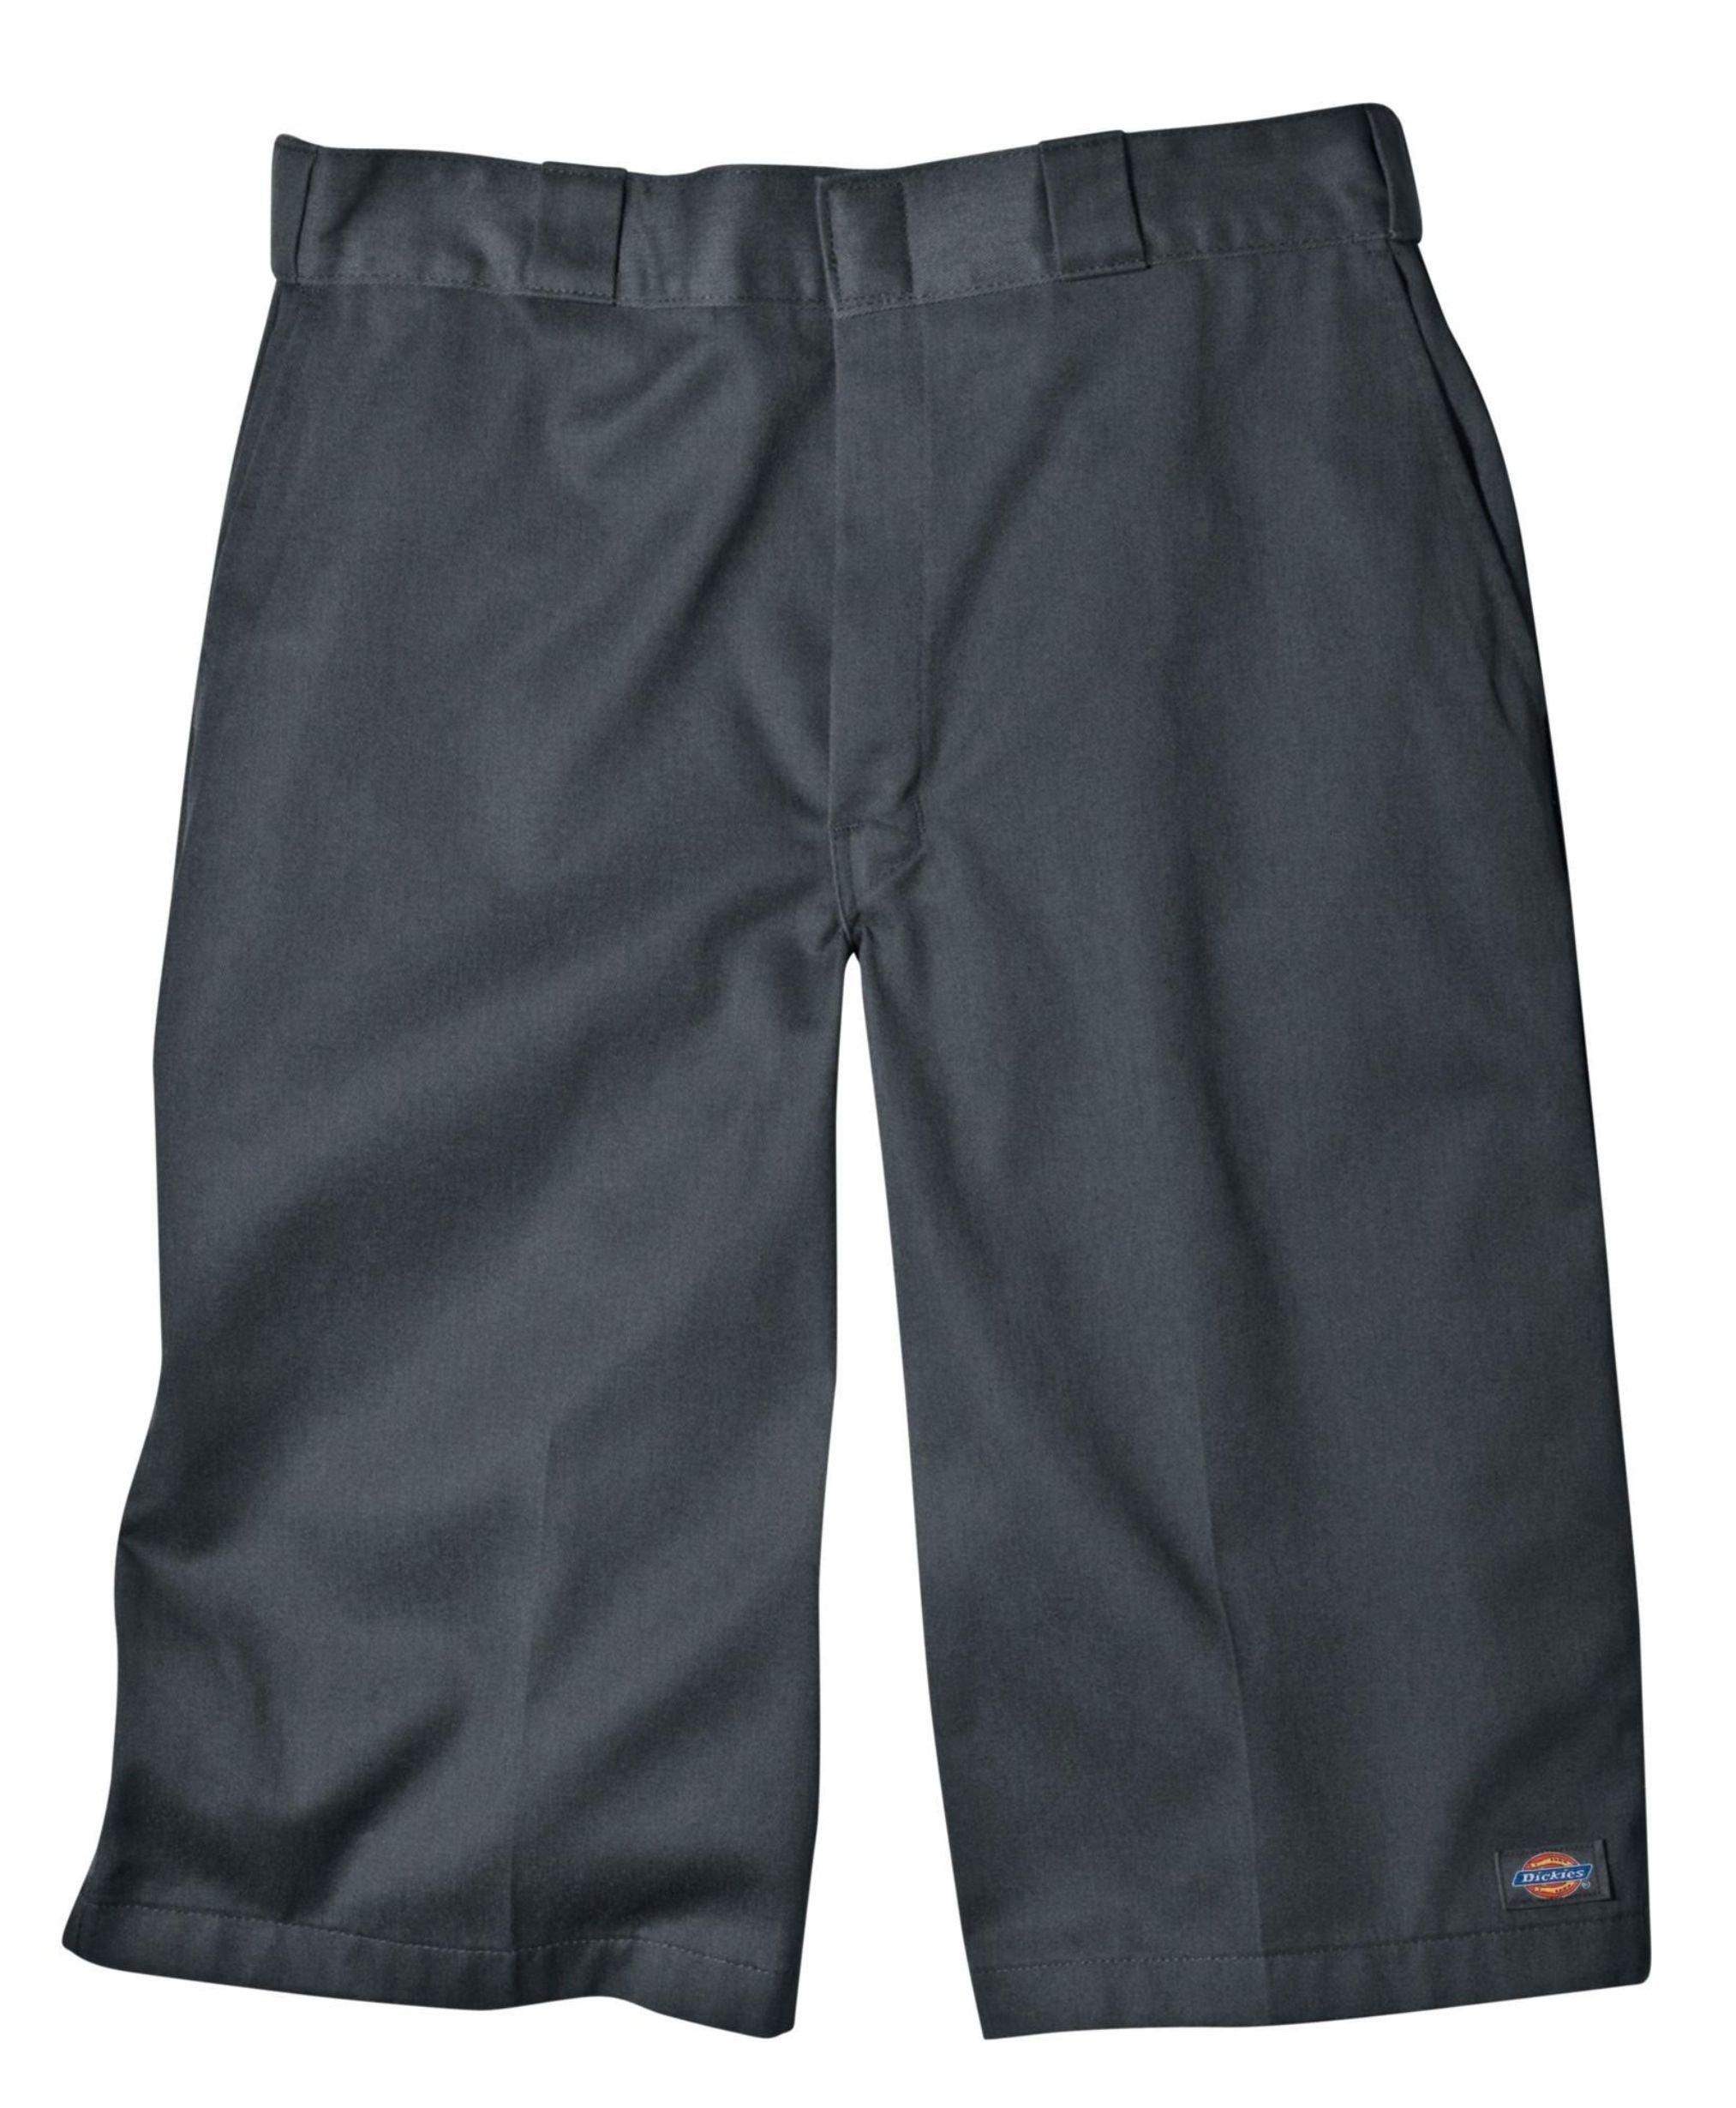 Dickies 41283 15'' Loose Fit Multi-Pocket Work Short-Charcoal-46